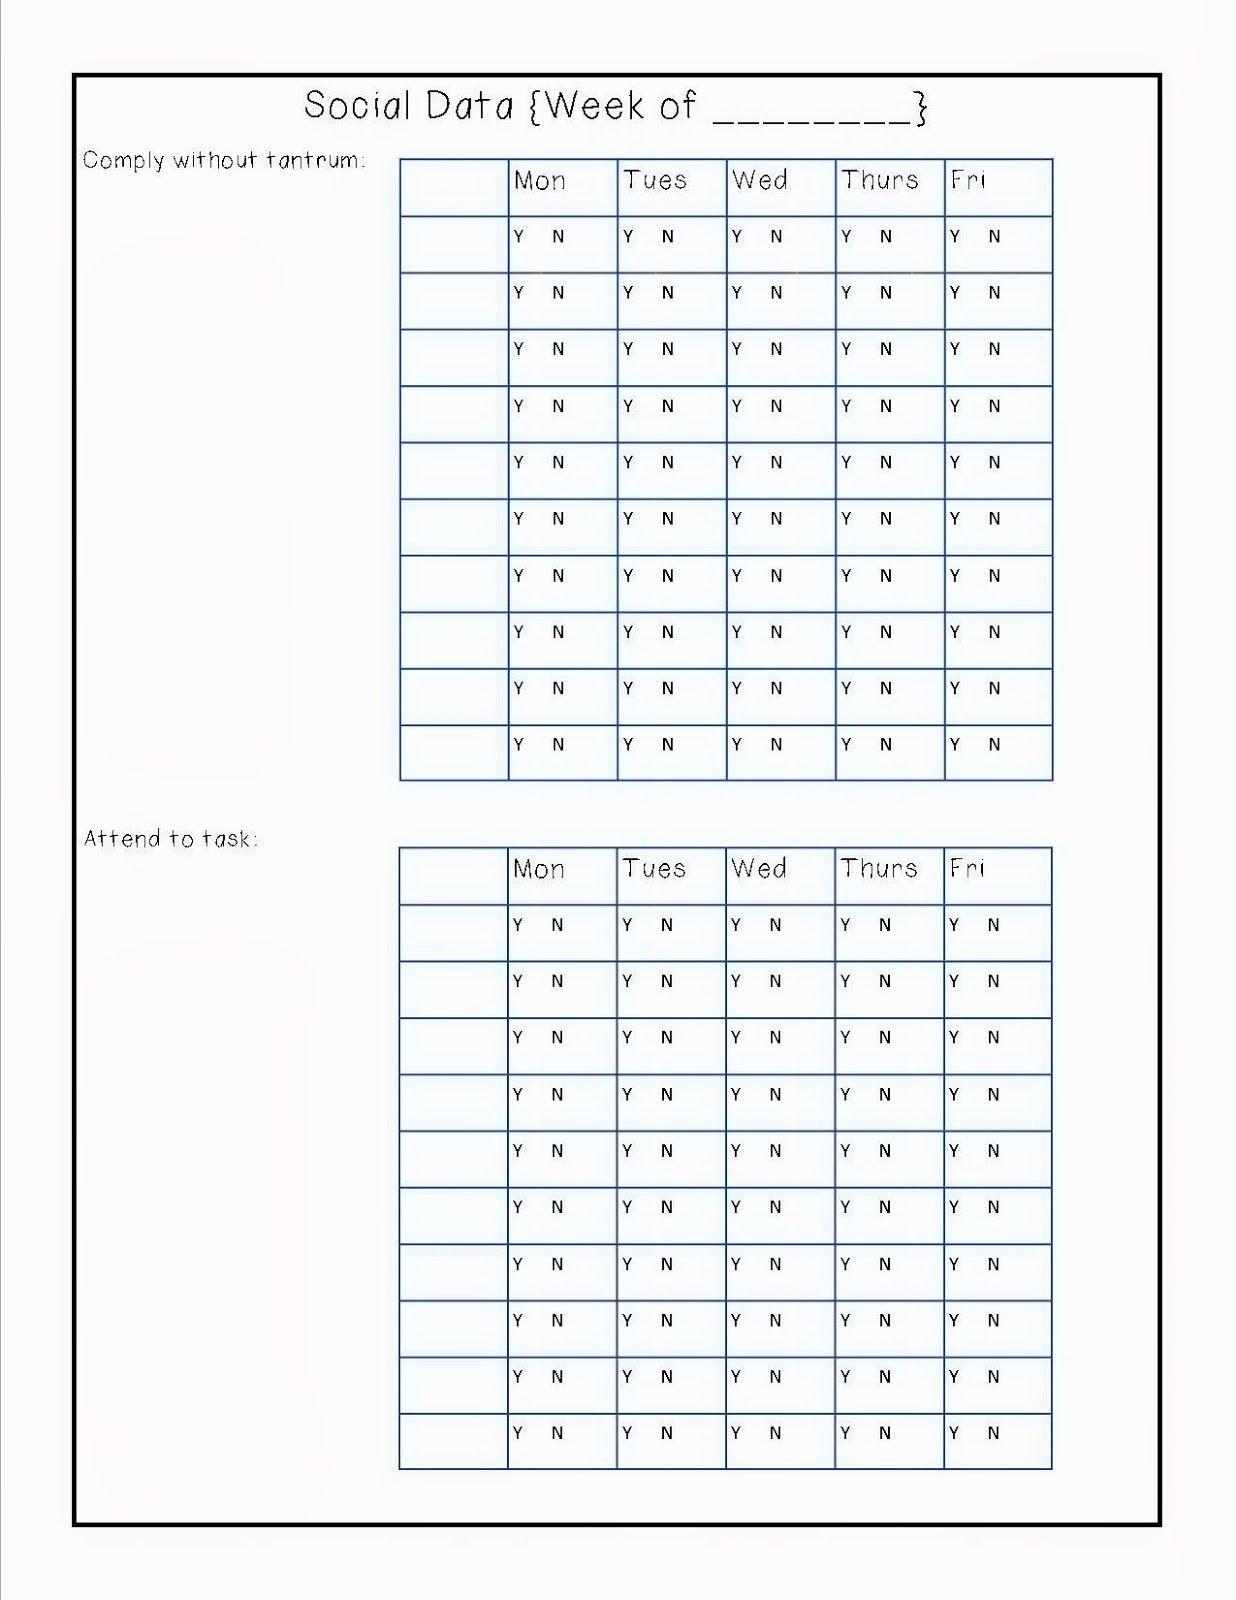 wholegroupdataforms2.jpg 1,236×1,600 pixels